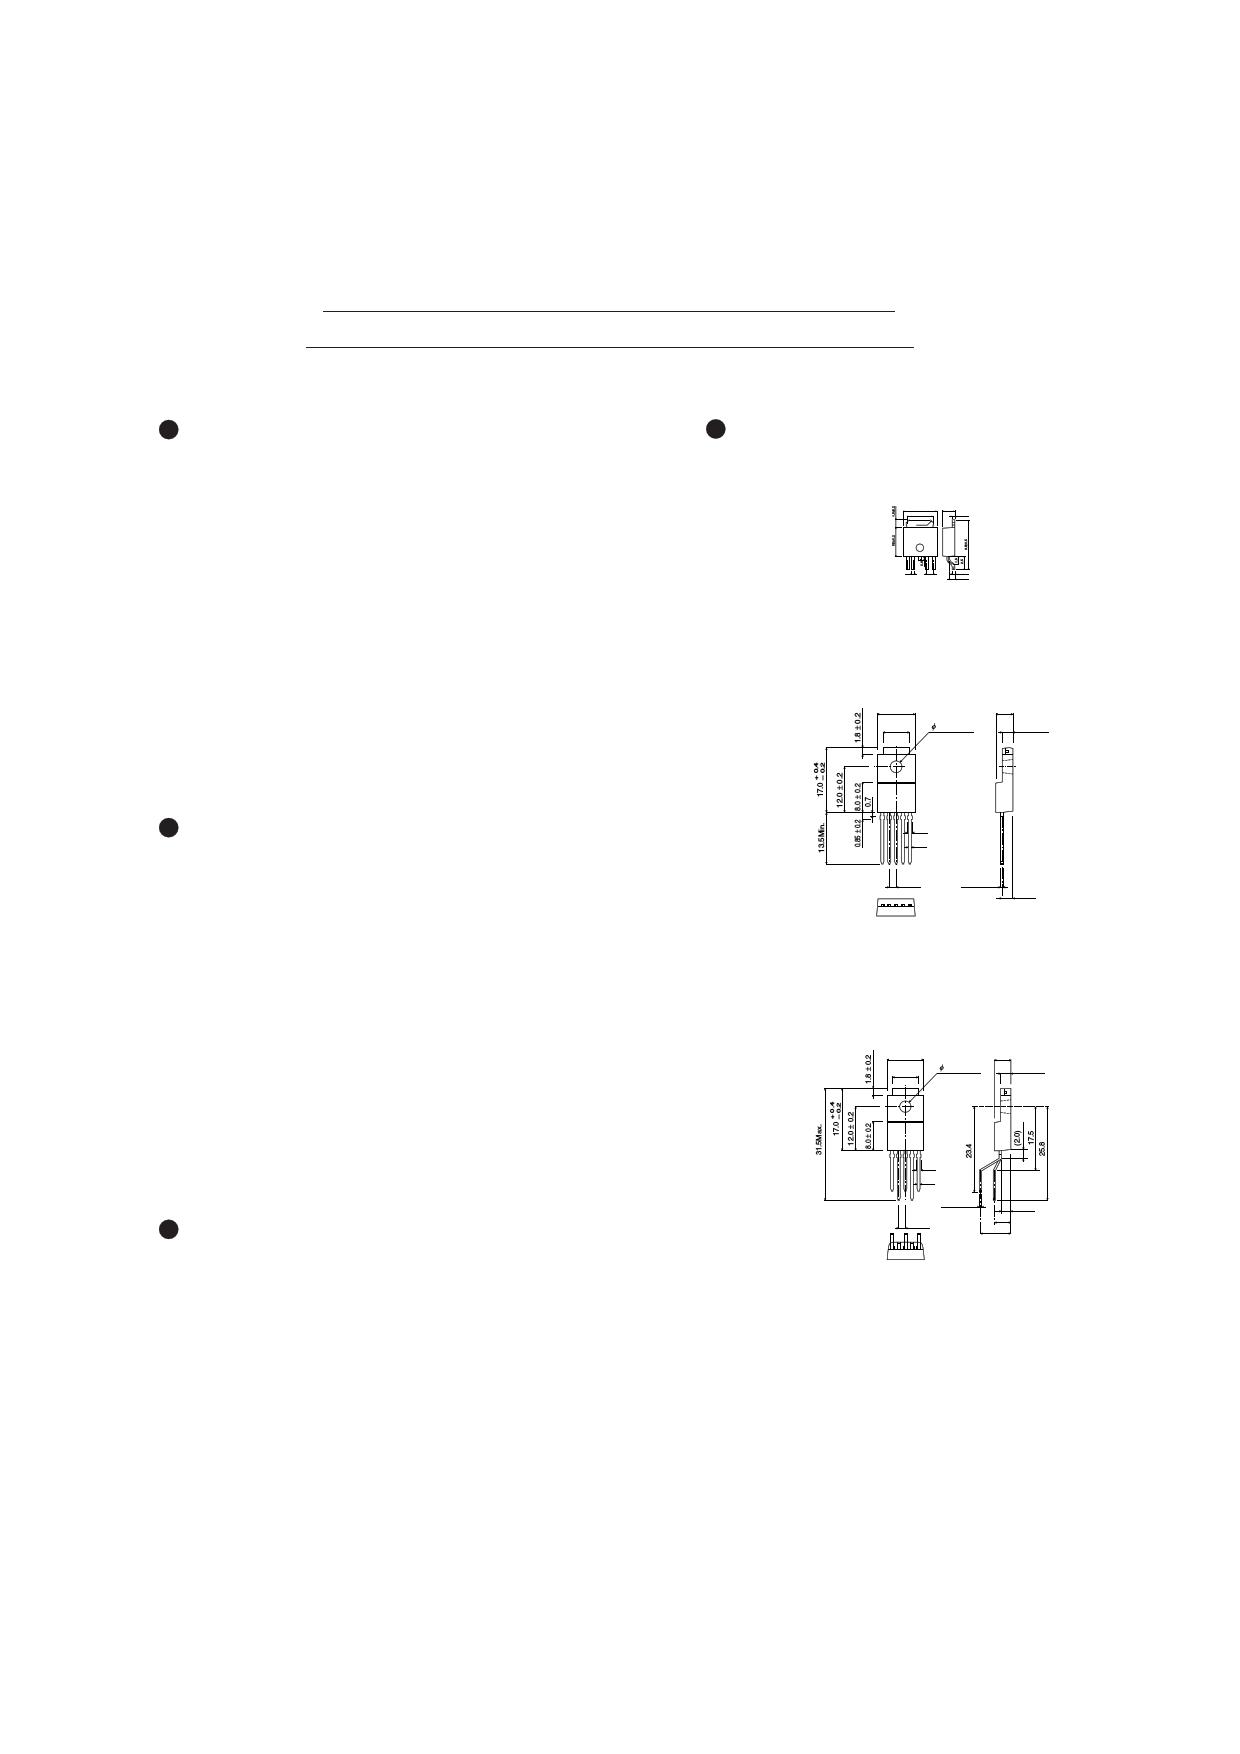 BA00CC0WFPWT-V5 datasheet